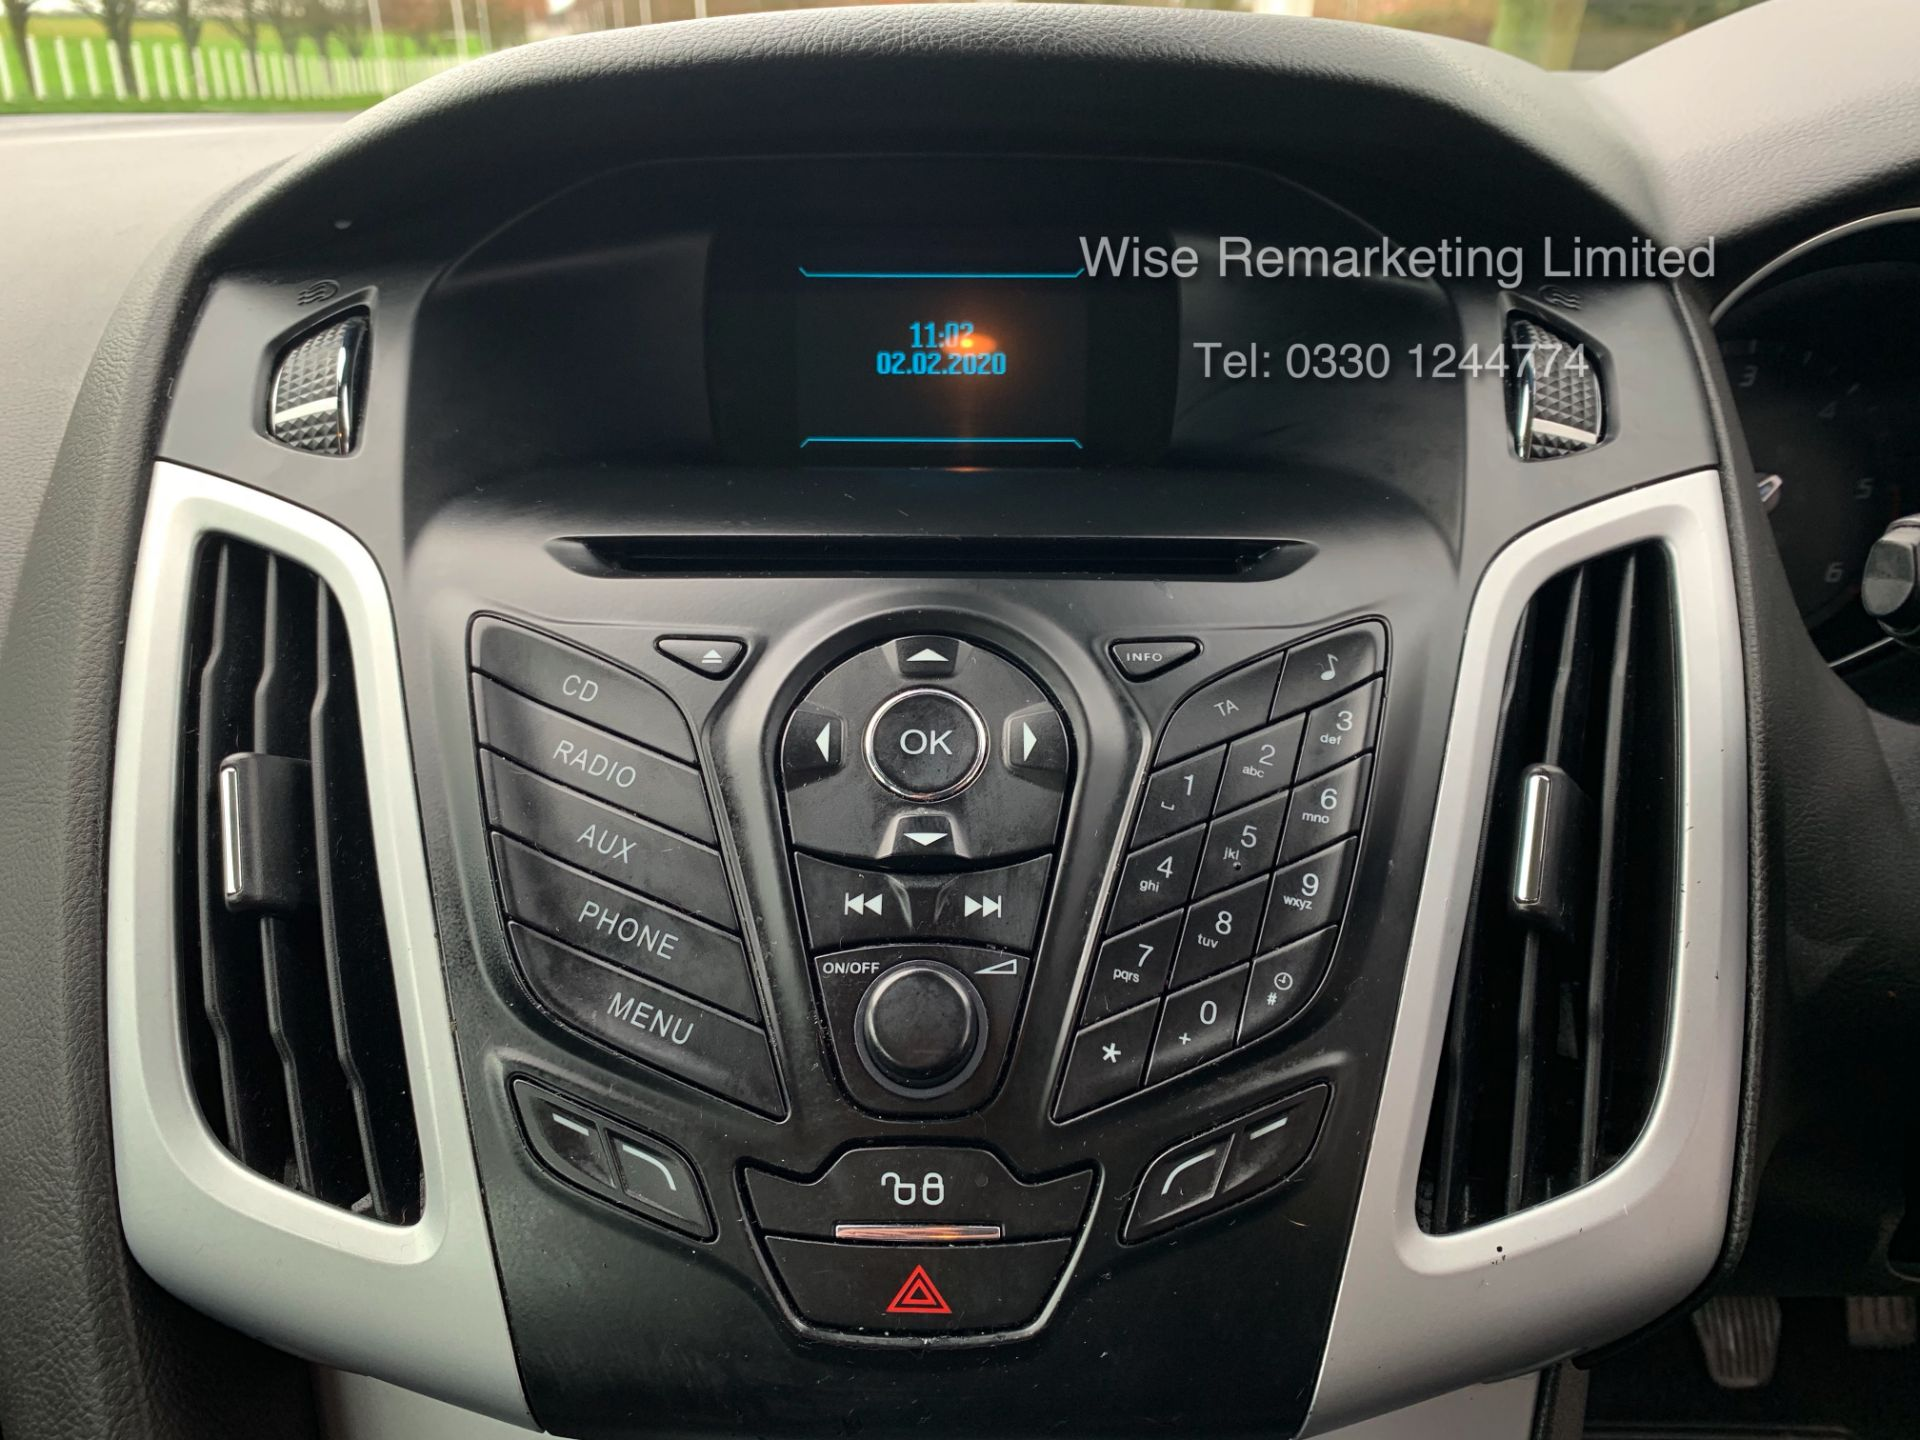 Ford Focus Zetec 1.6 TDCI Econetic - 2015 Model - 6 Speed - - Image 19 of 20